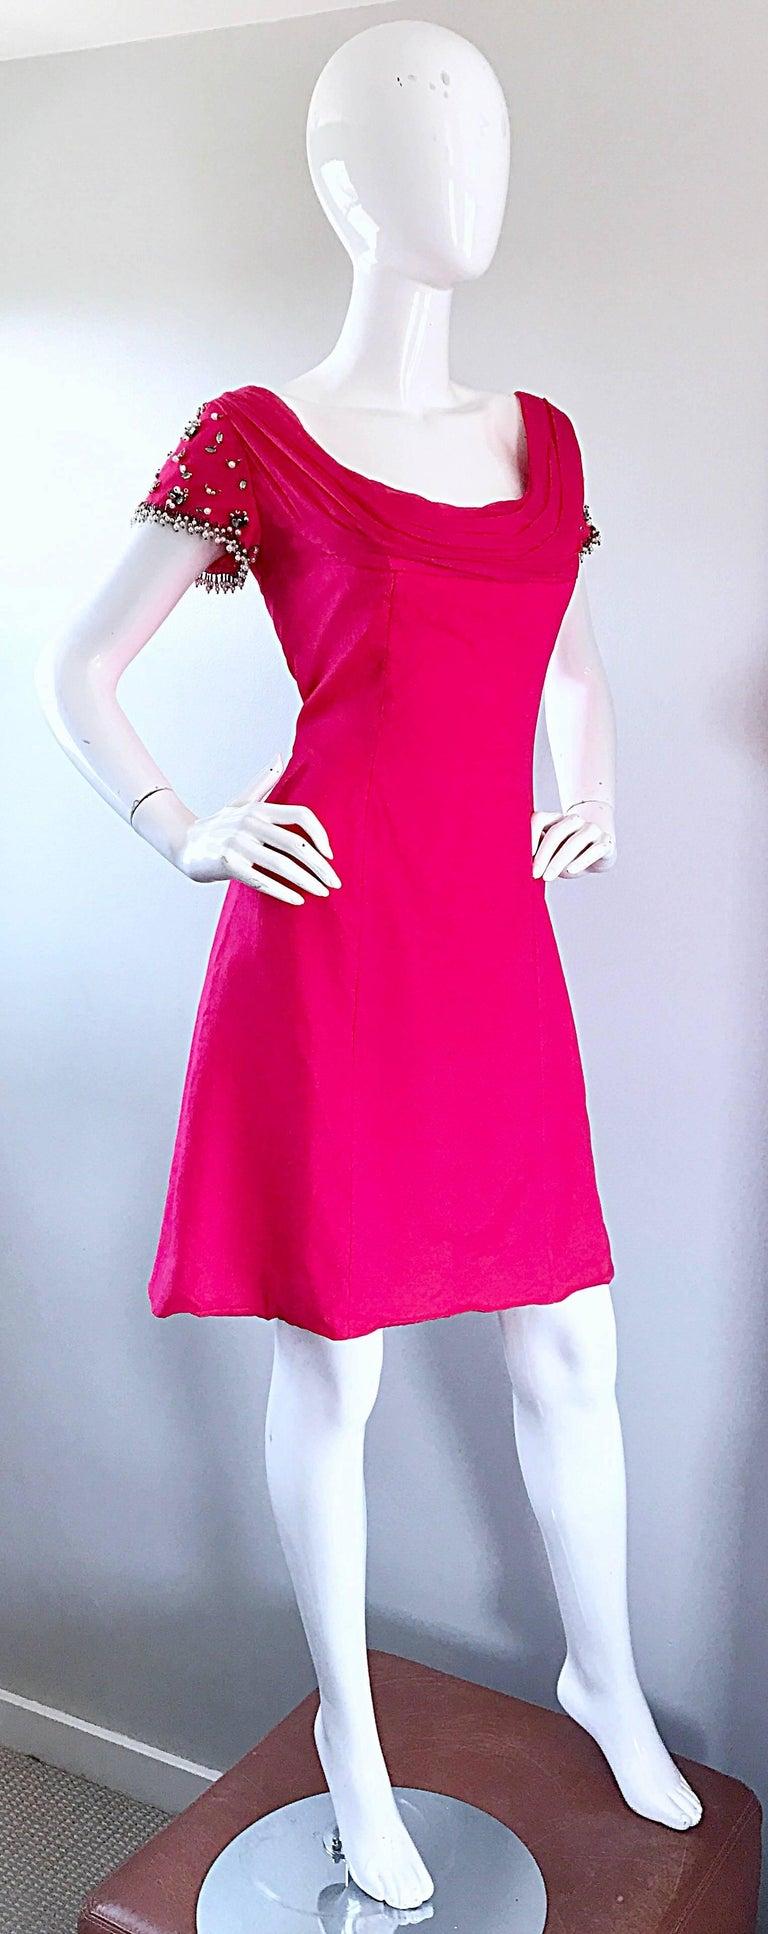 1960s Lilli Diamond Deadstock Hot Pink Fuchsia Vintage 60s A Line Chiffon Dress For Sale 5